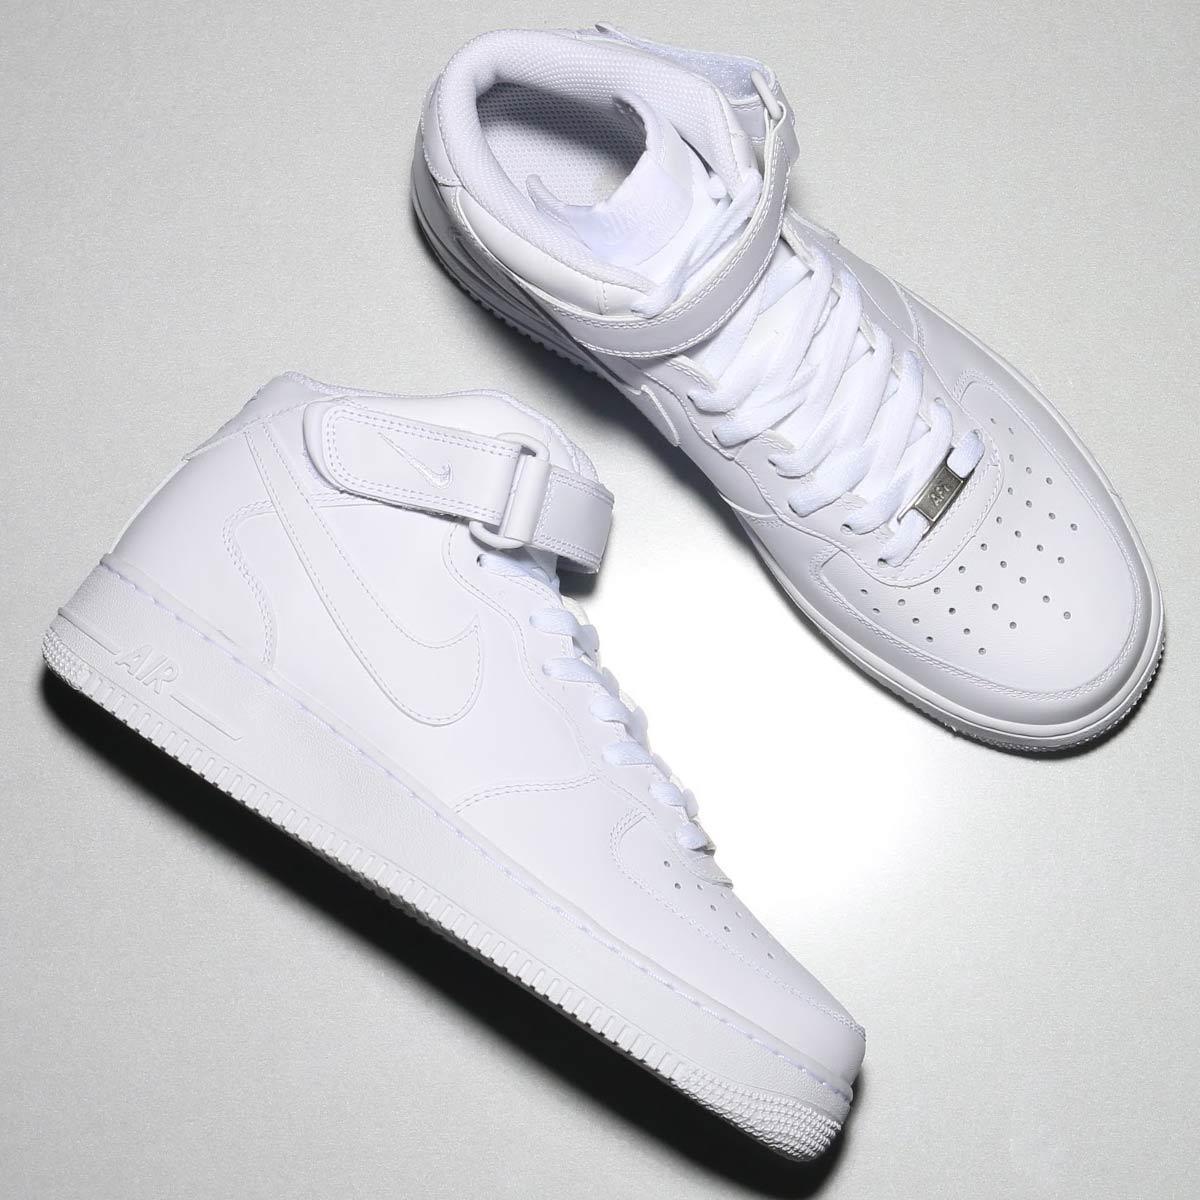 NIKE AIR FORCE 1 MID  07 (Nike air force 1 mid  07) WHITE WHITE CRYOVR 28c49241a0